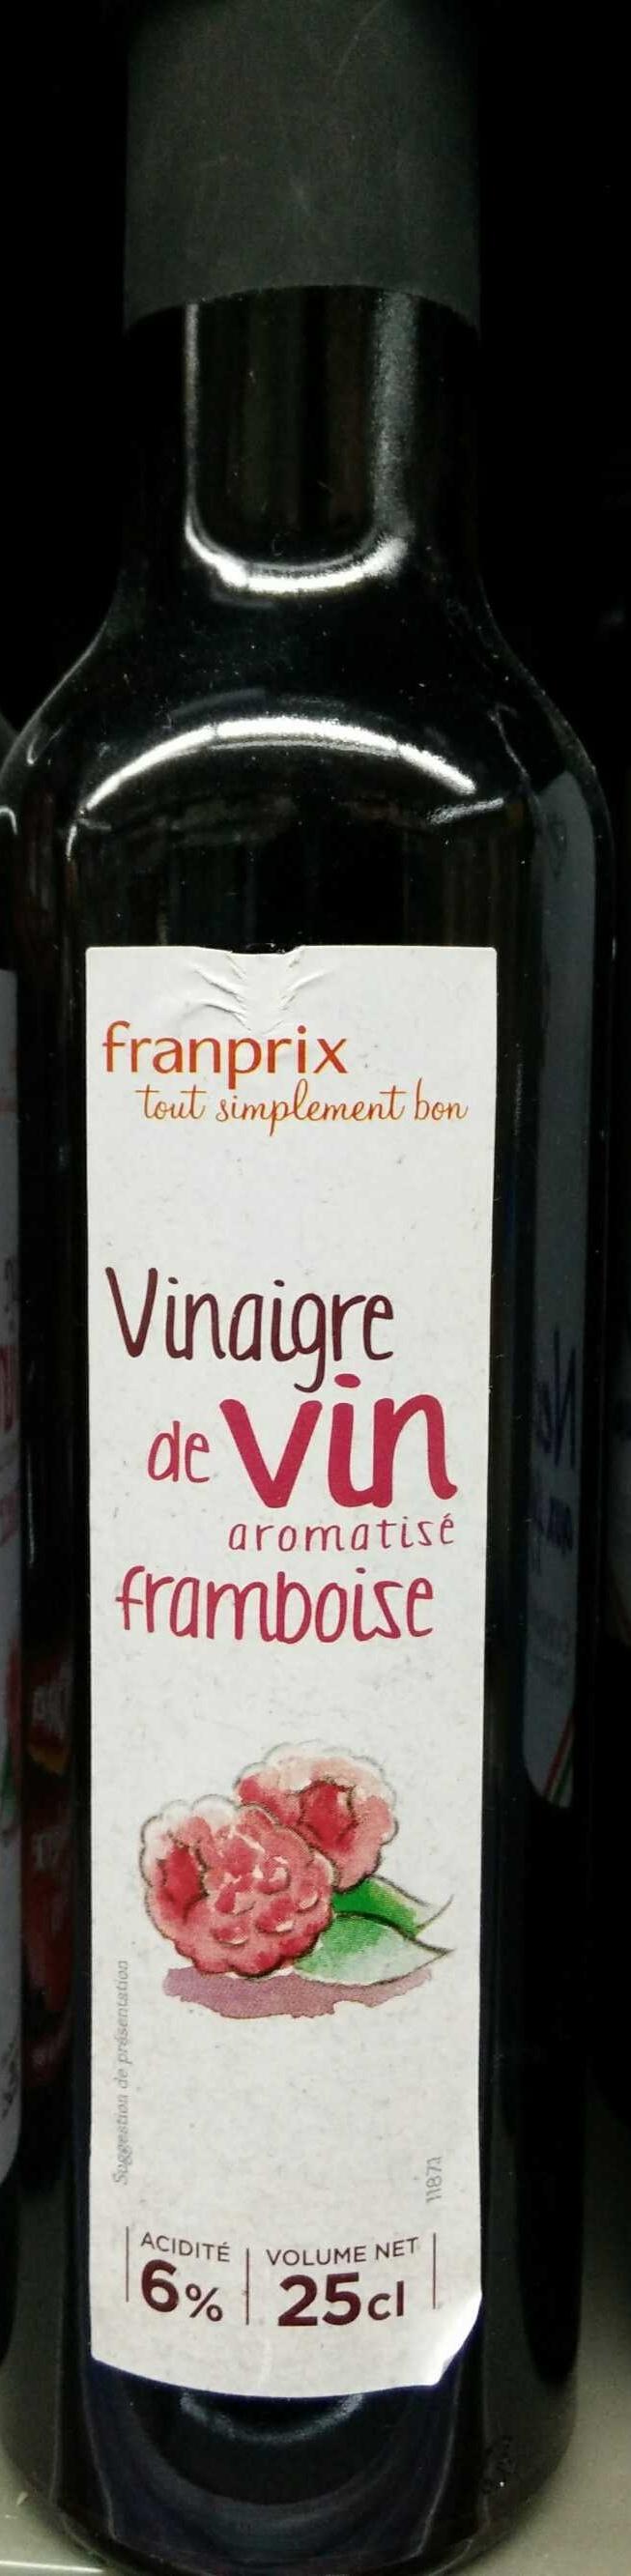 Vinaigre de vin aromatisé framboise 6% - Produit - fr